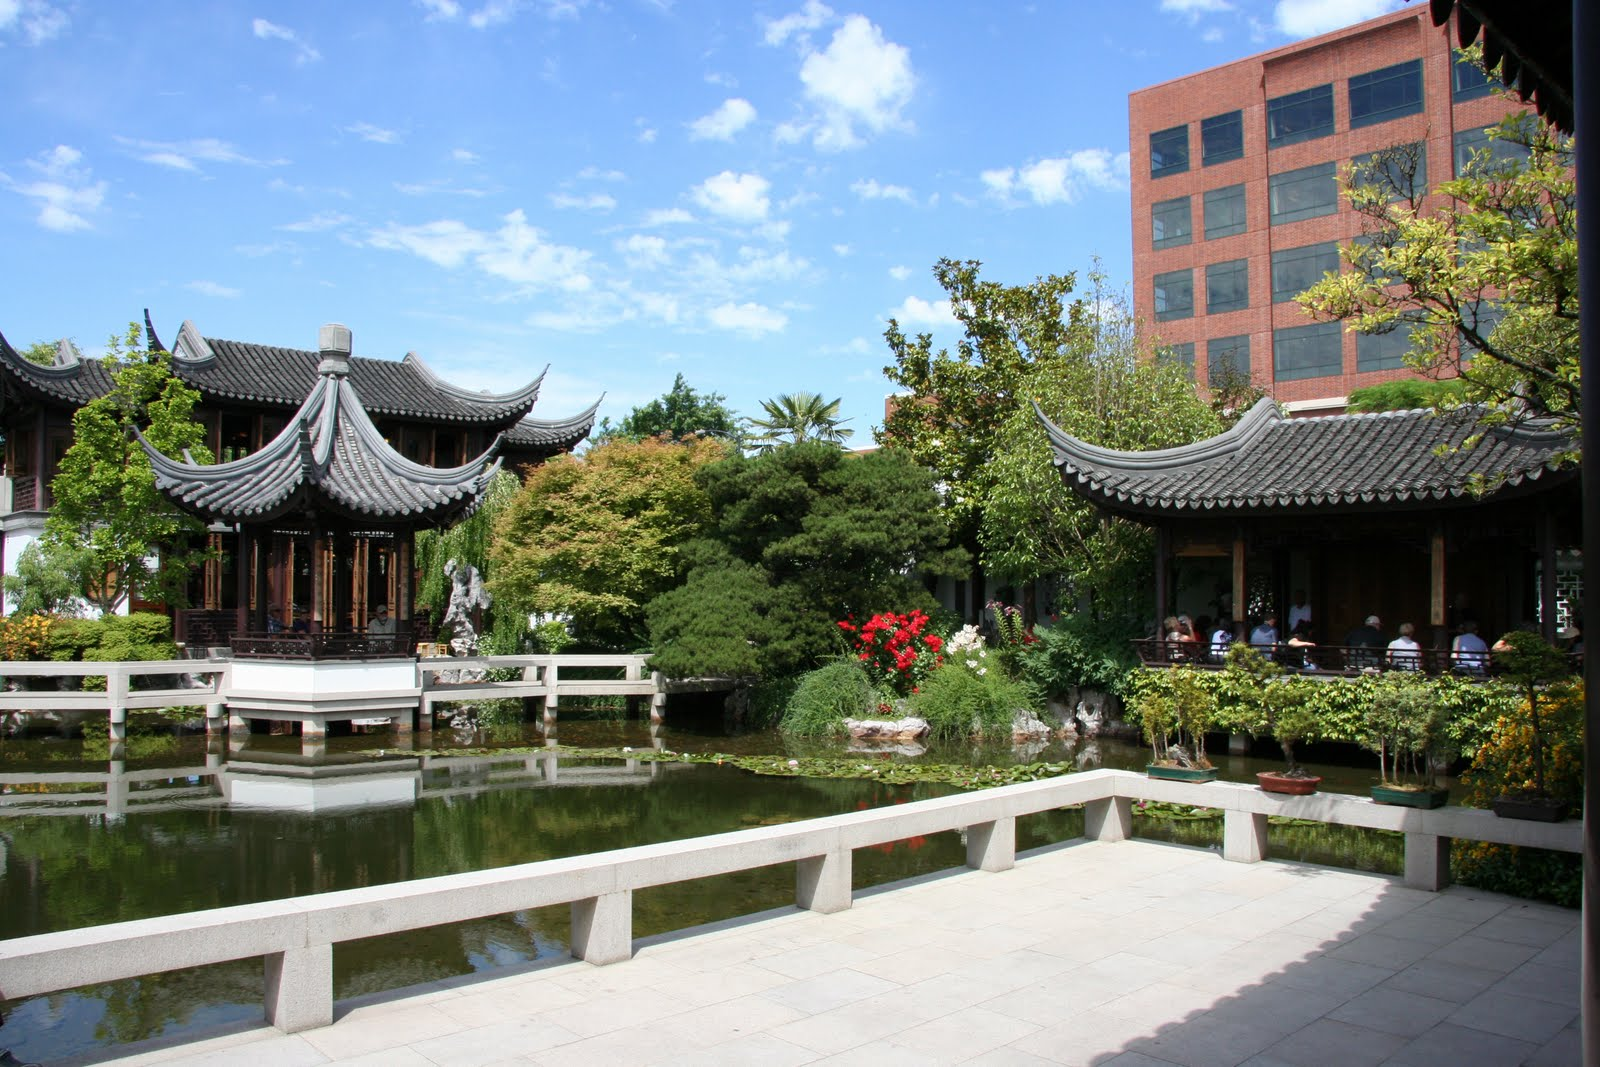 Daffodils Daydreams Garden Visit Lan Su Chinese Garden in